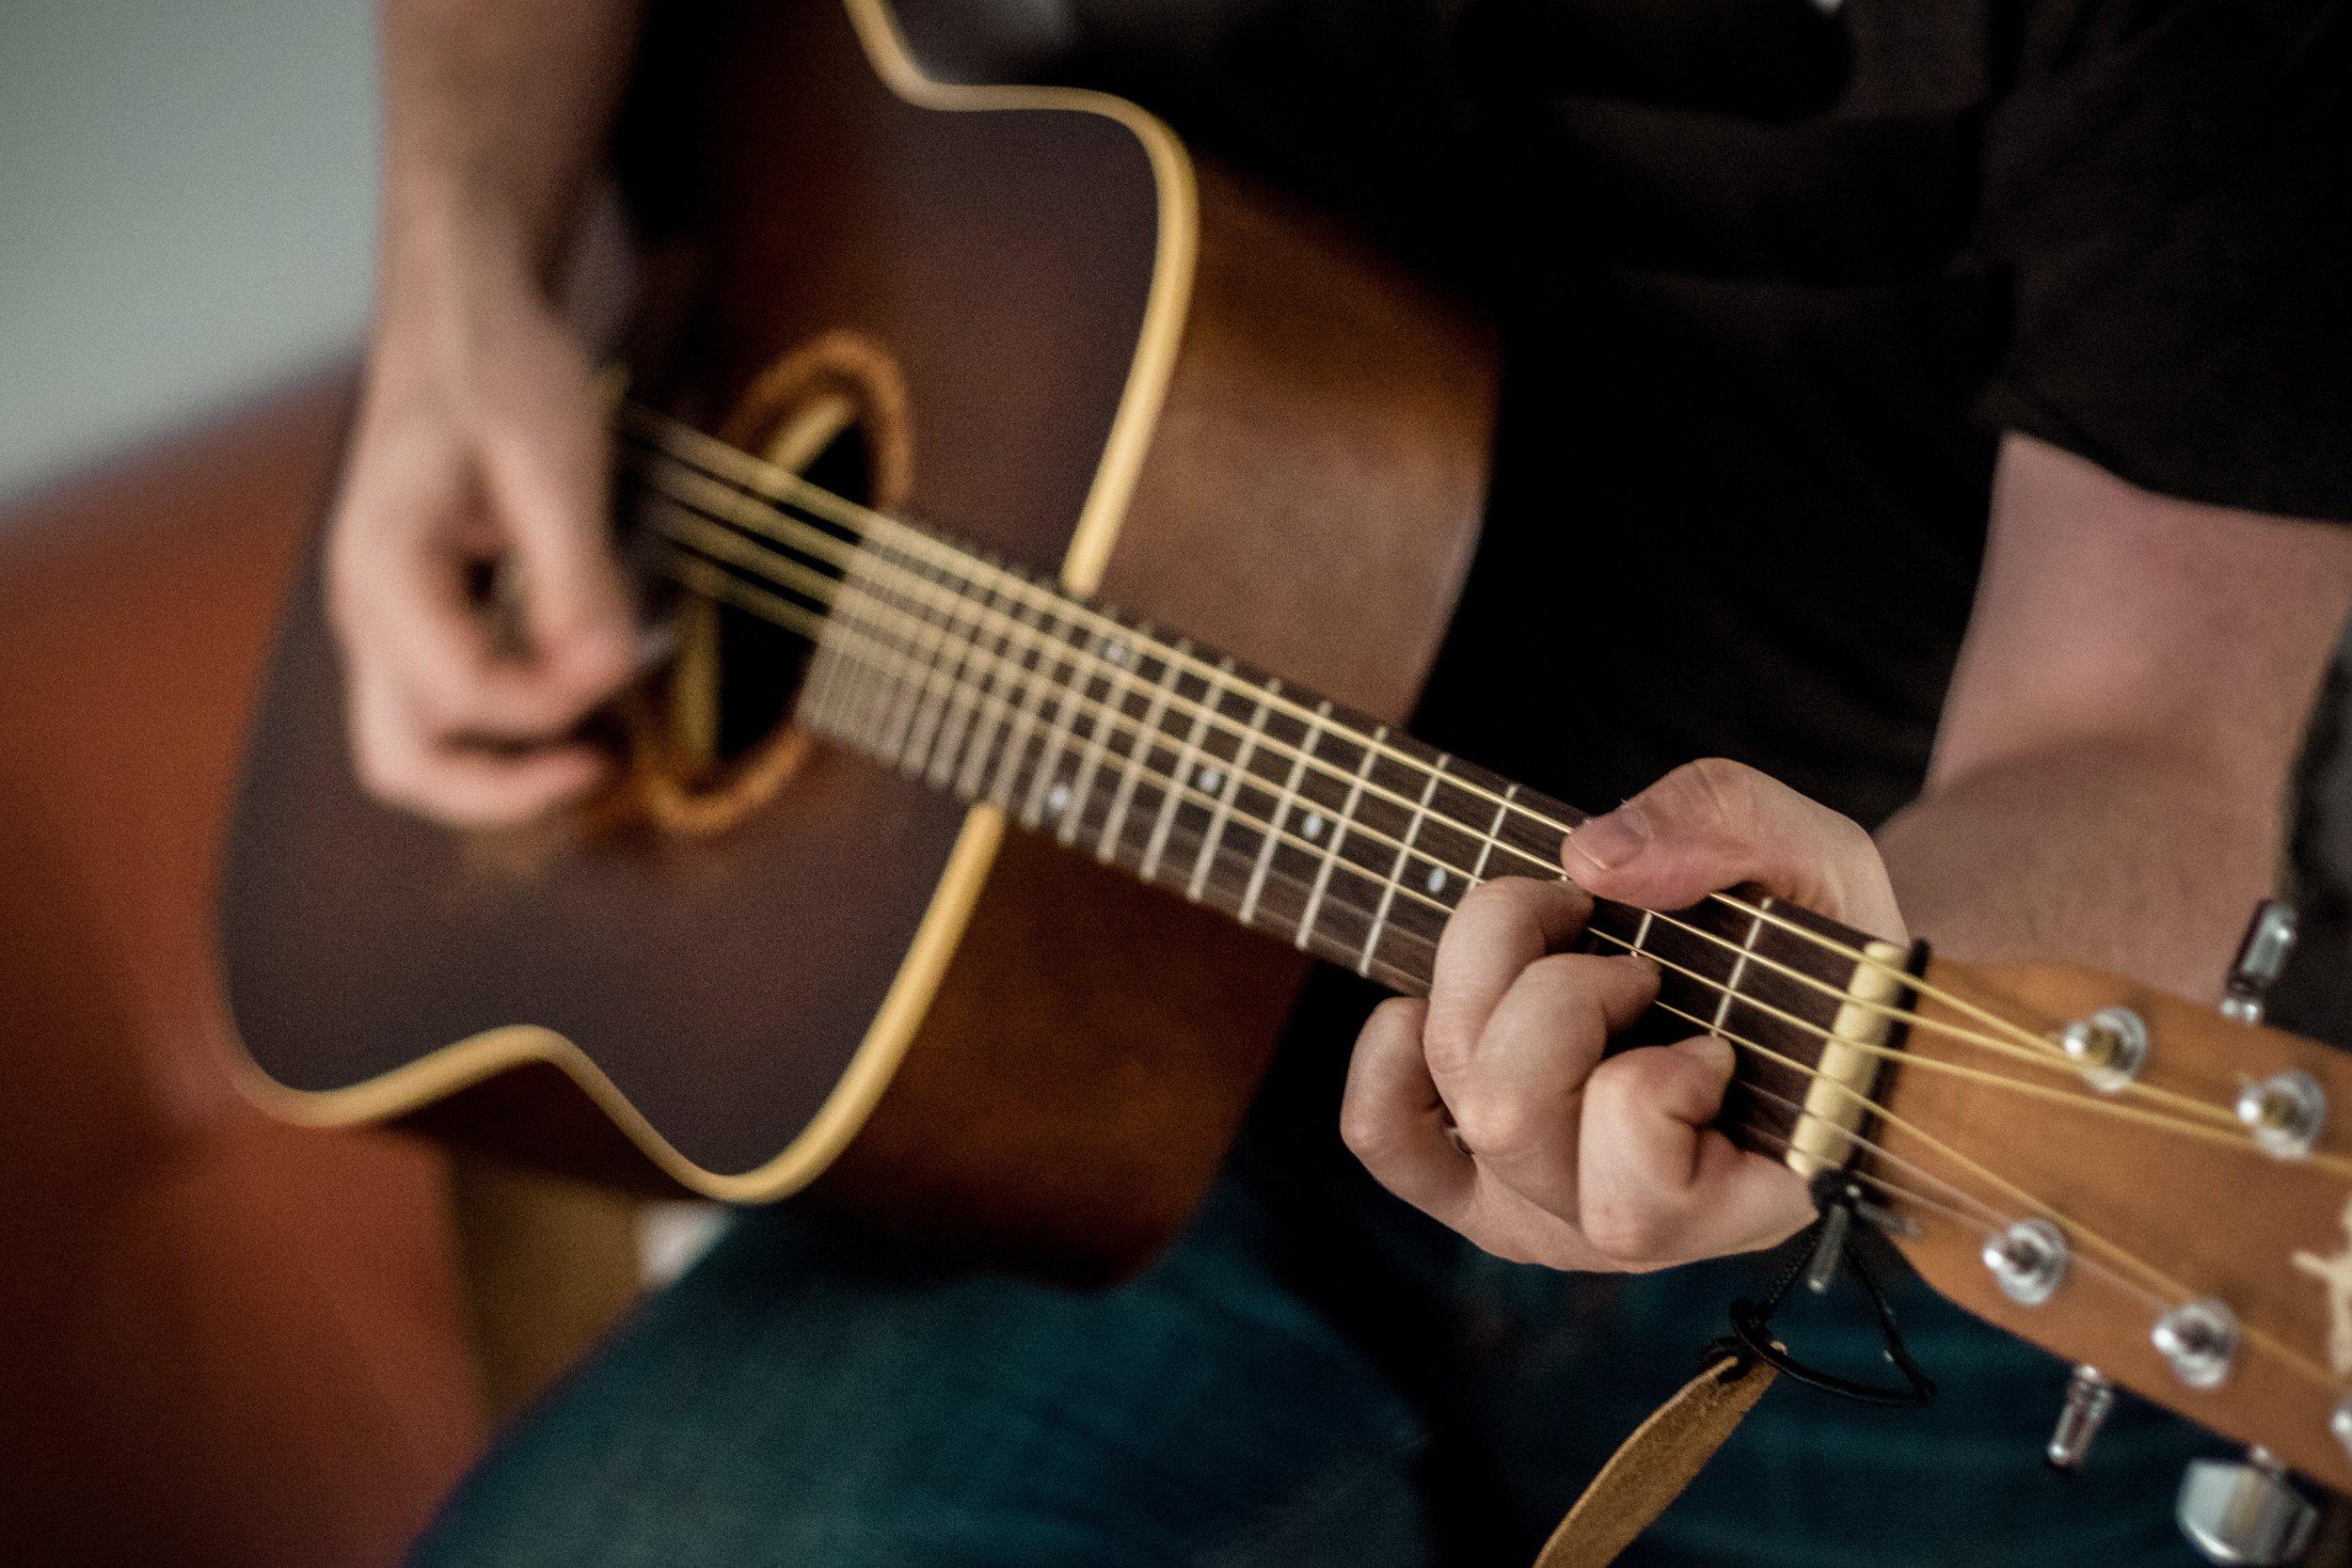 bowed-stringed-instrument-brown-chord-1407322.jpg